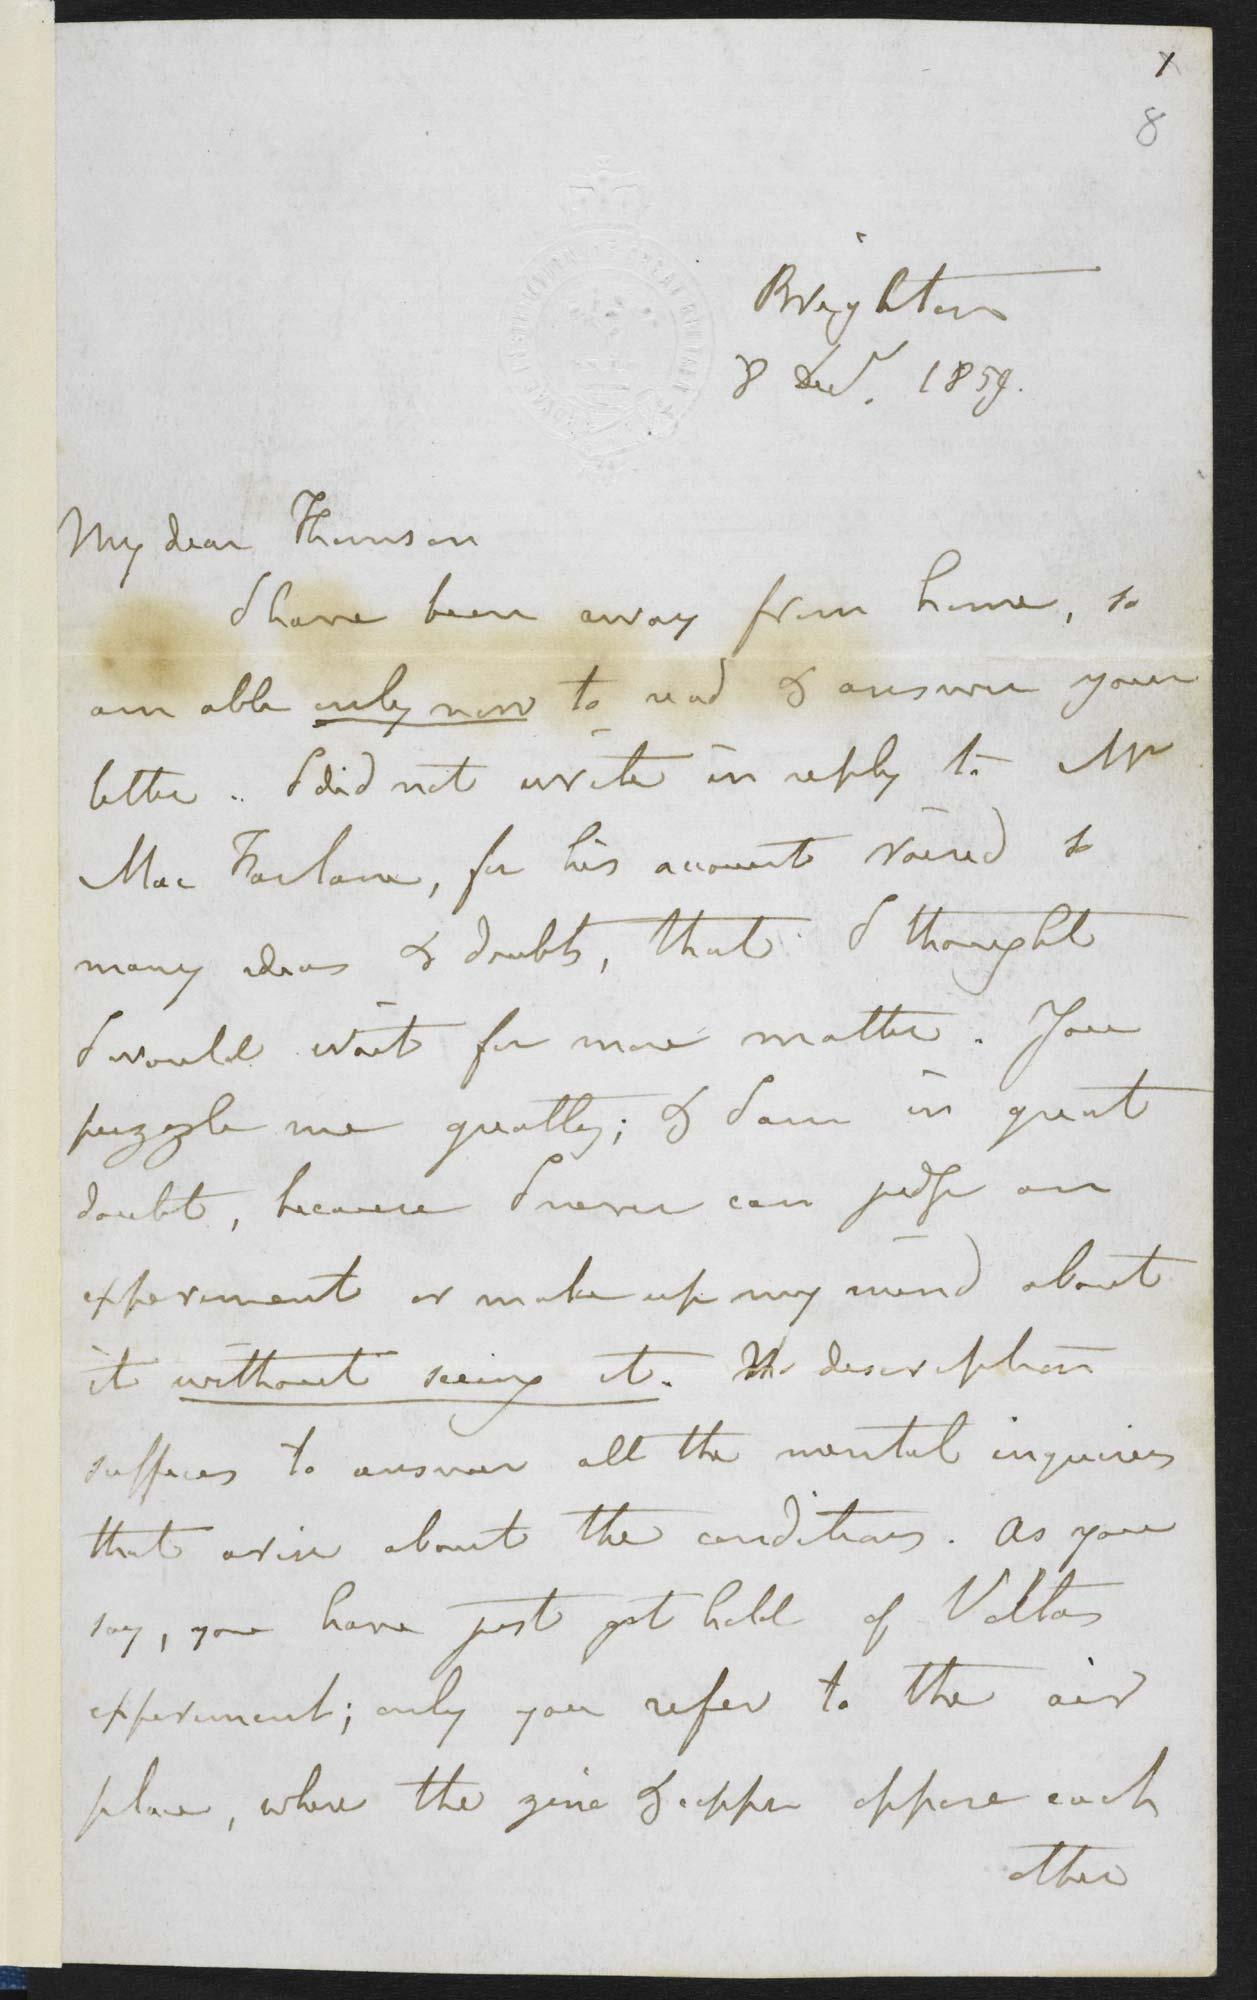 Michael Faraday's letter to William Thomson, f.8